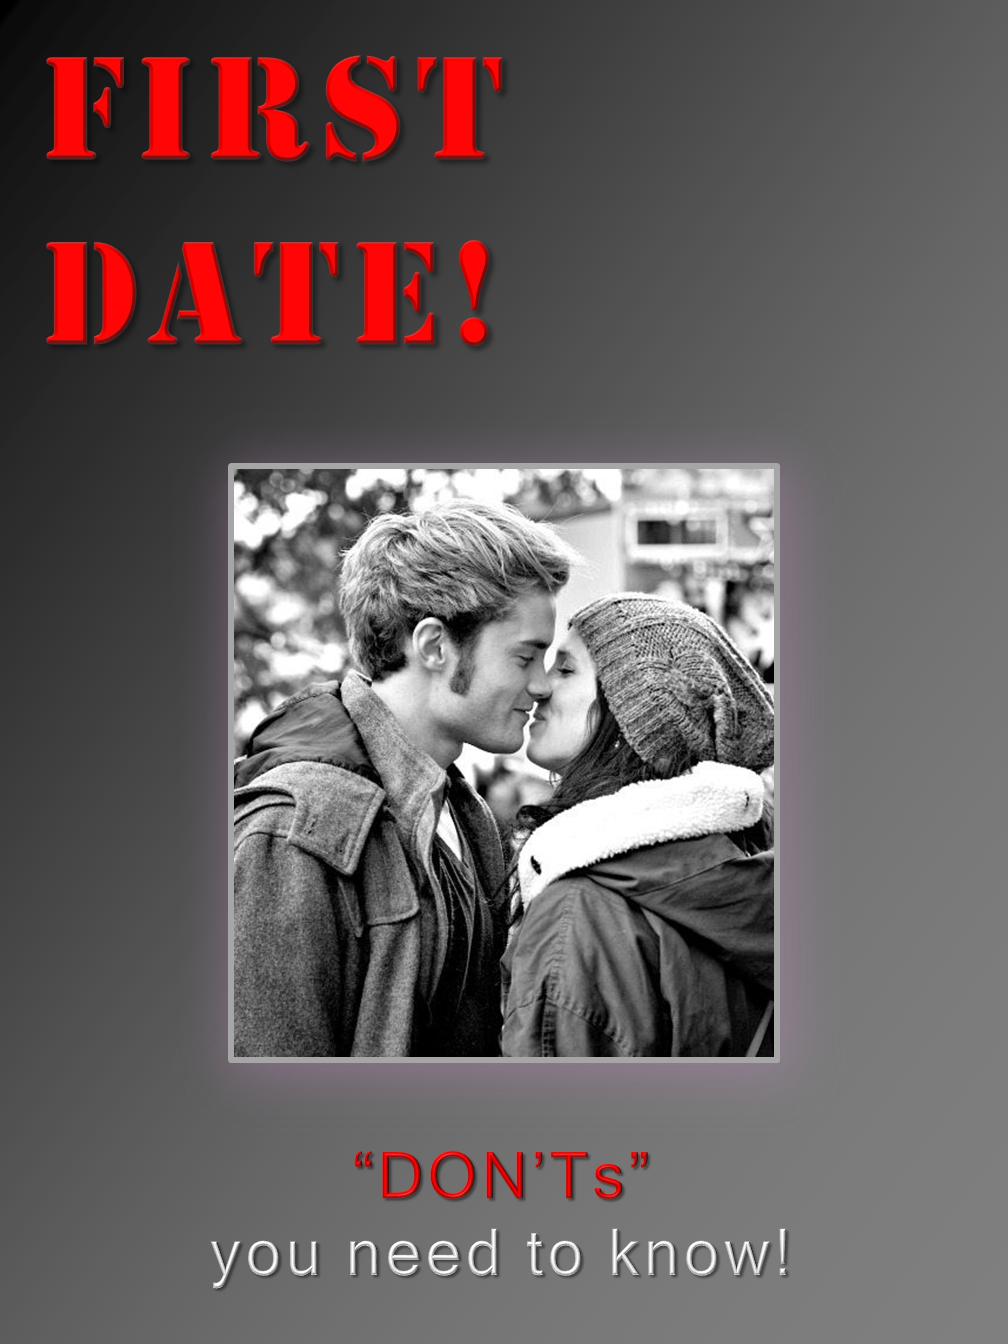 First Date!